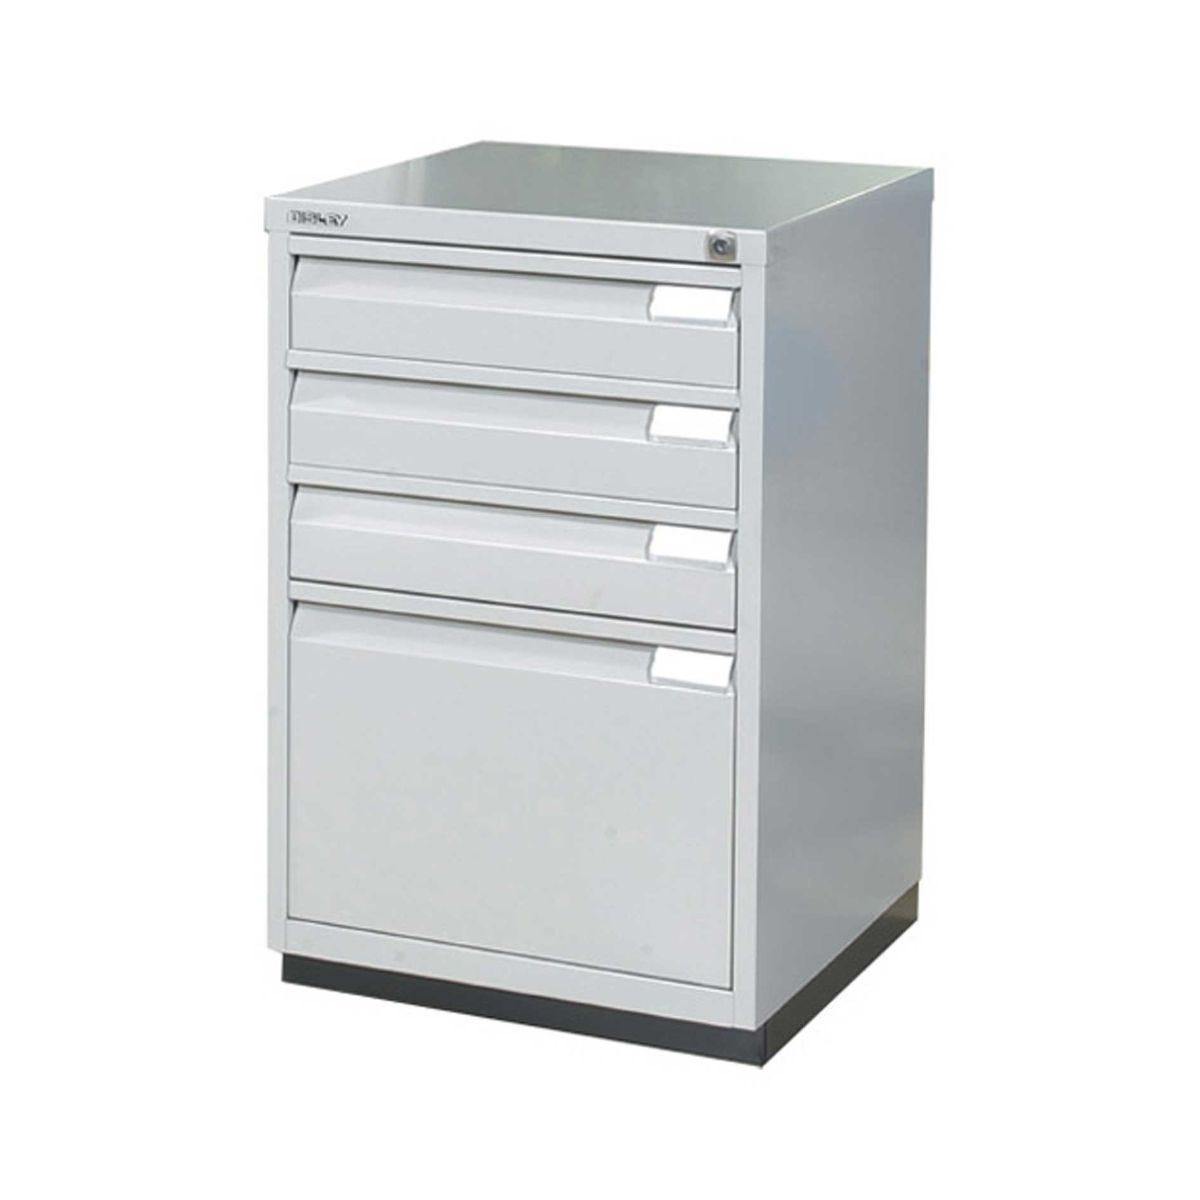 Bisley Filing Cabinet 1F3E Steel, Grey